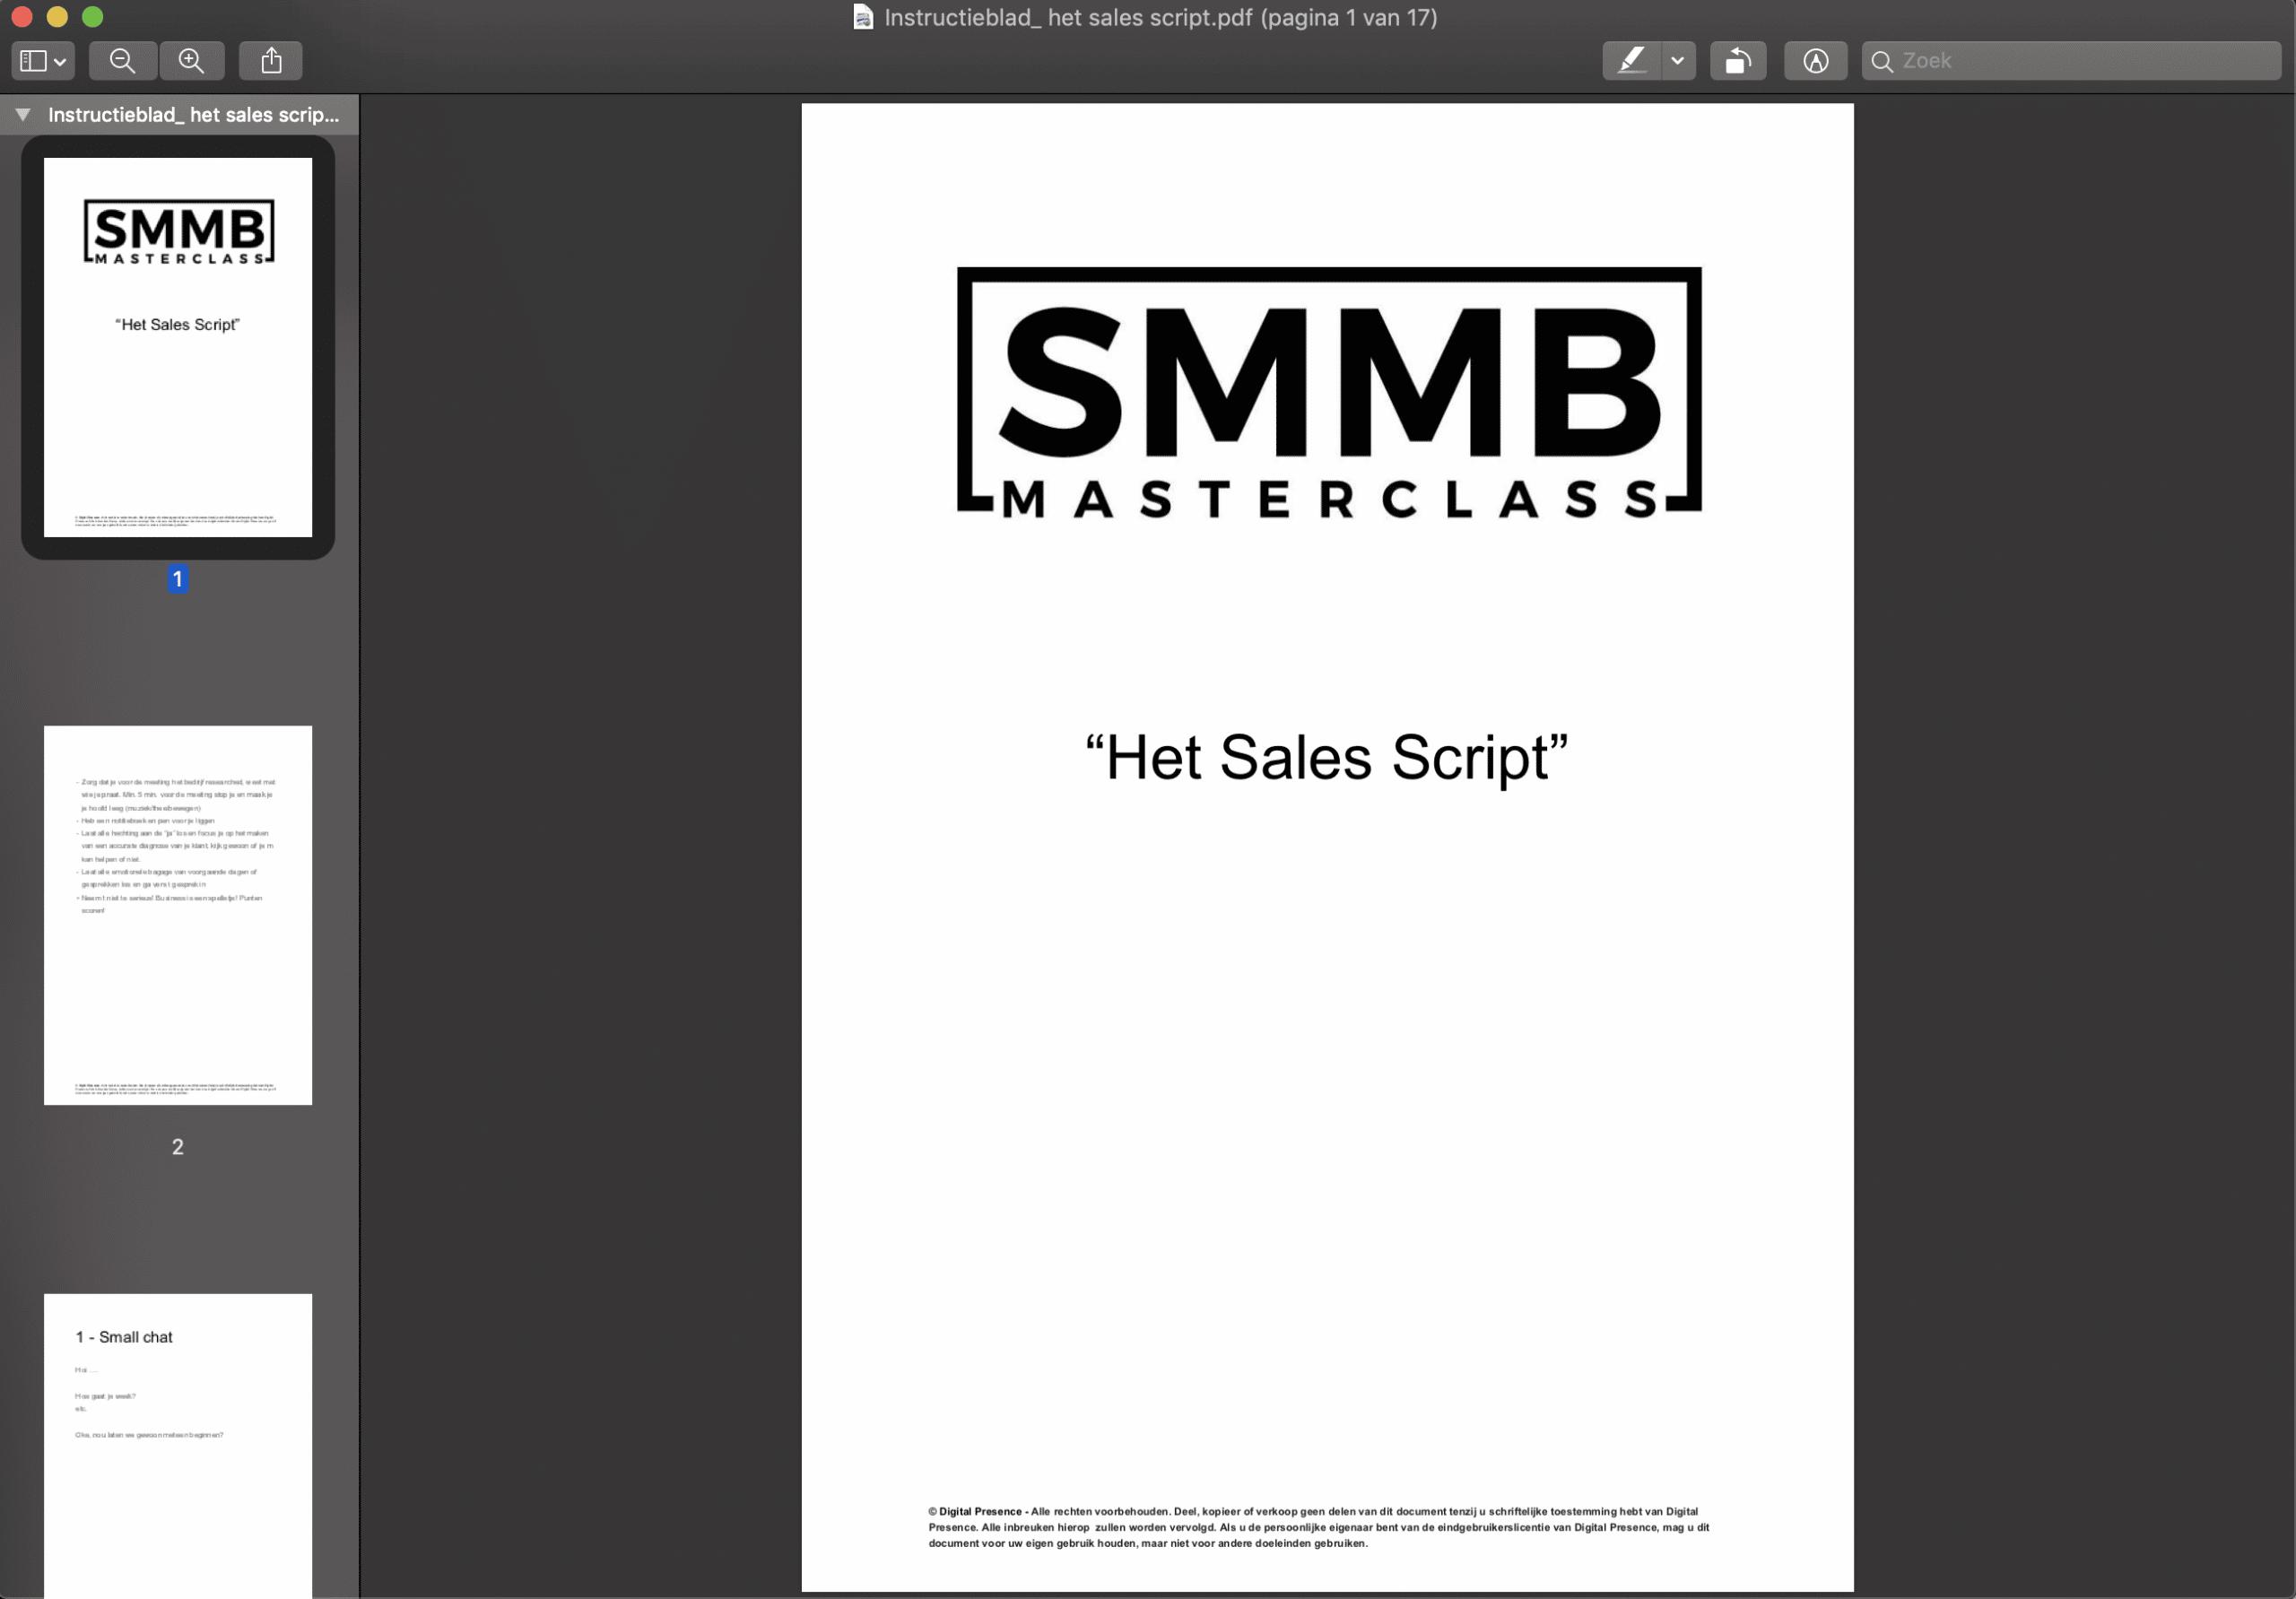 smmb-masterclass-sales-script